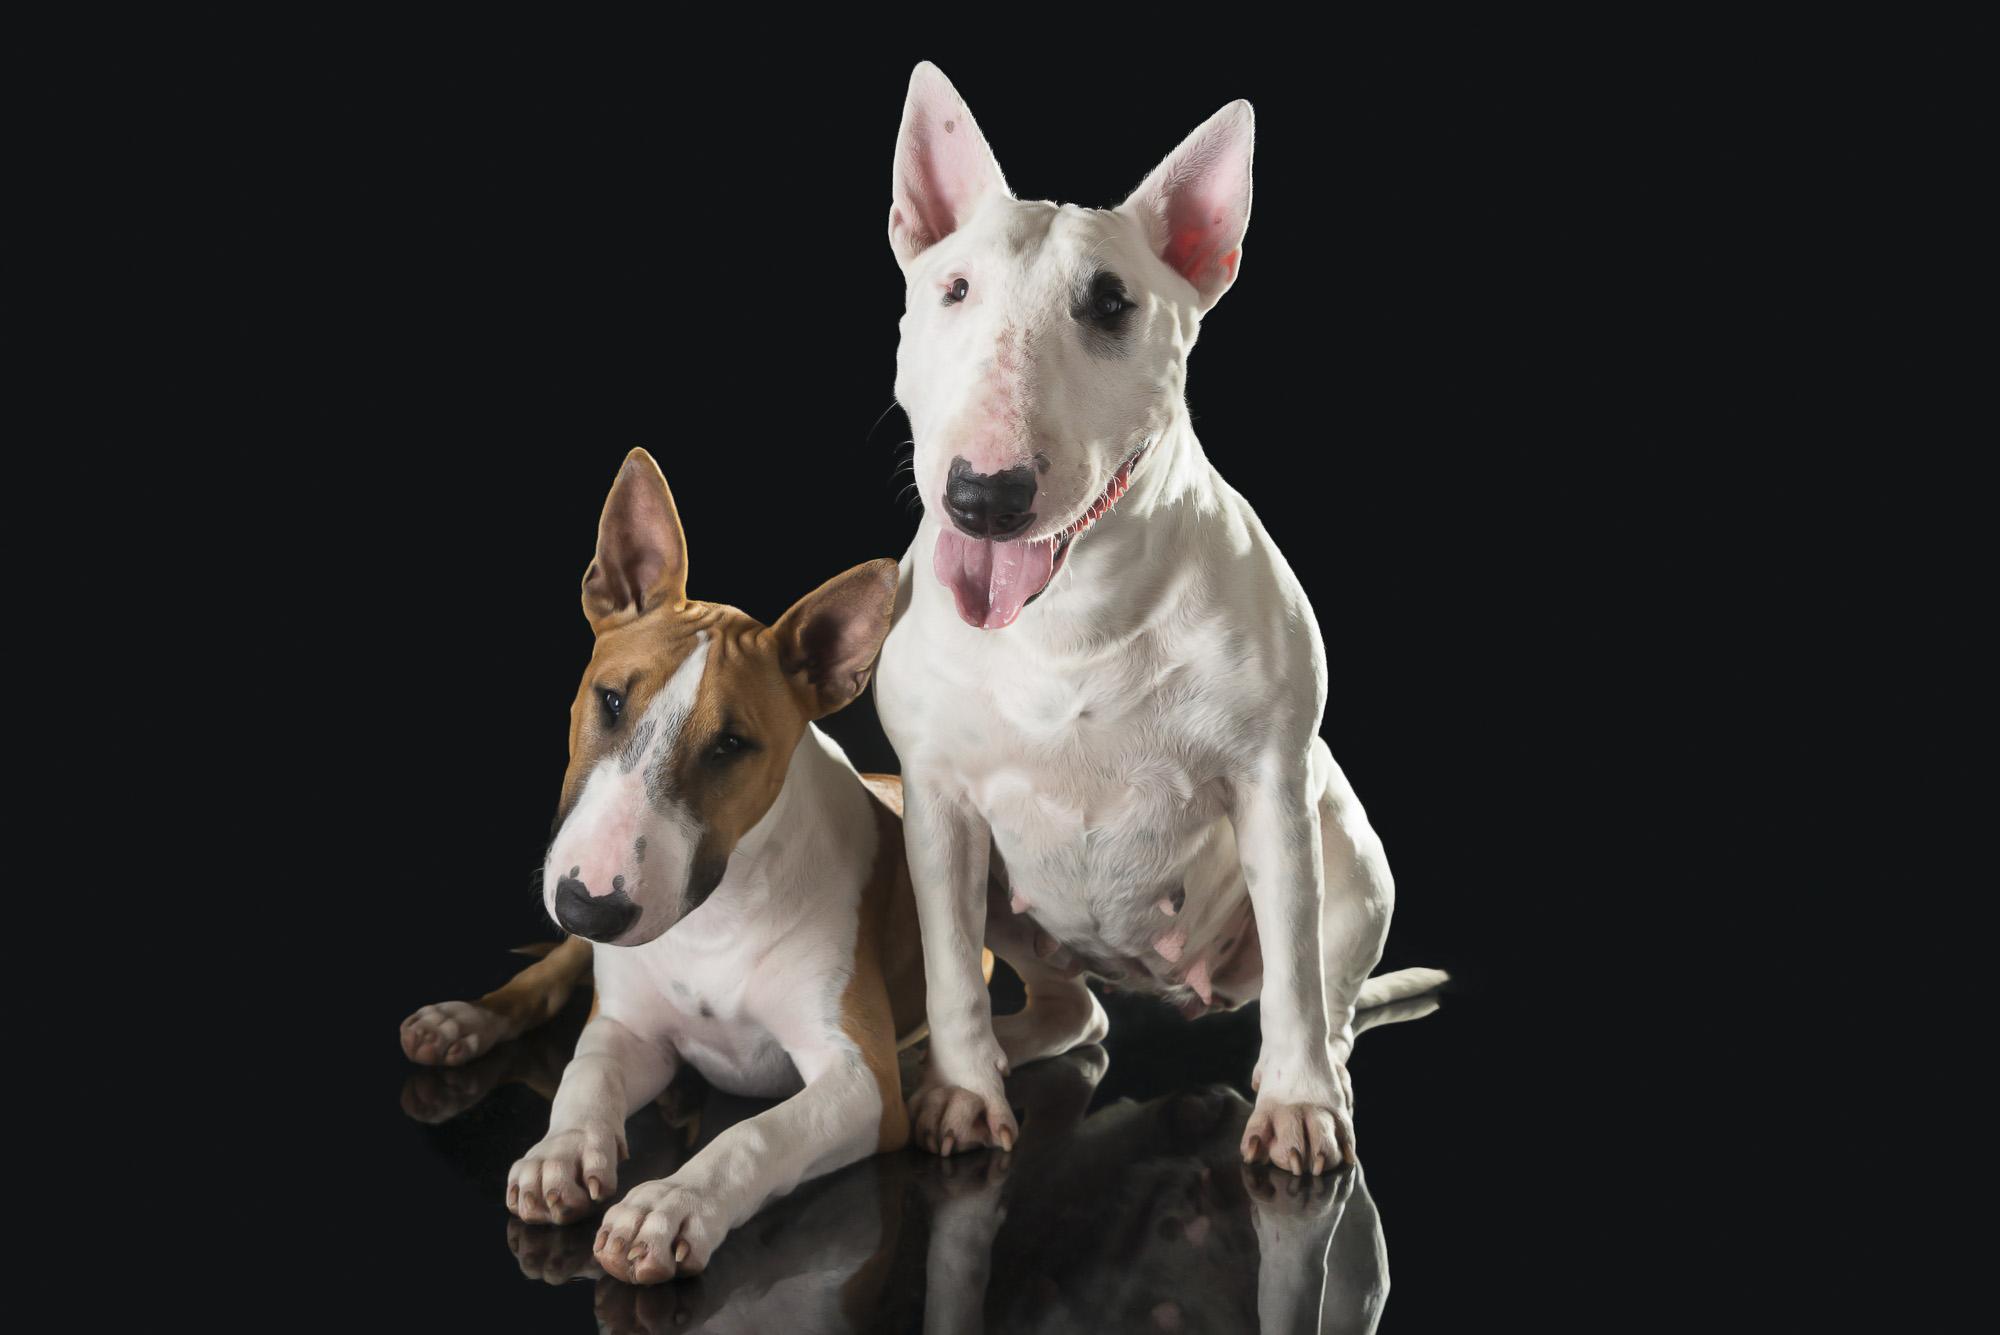 LupinBay-English-Bull-Terrier-Dog-Puppy-0165-5917.jpg